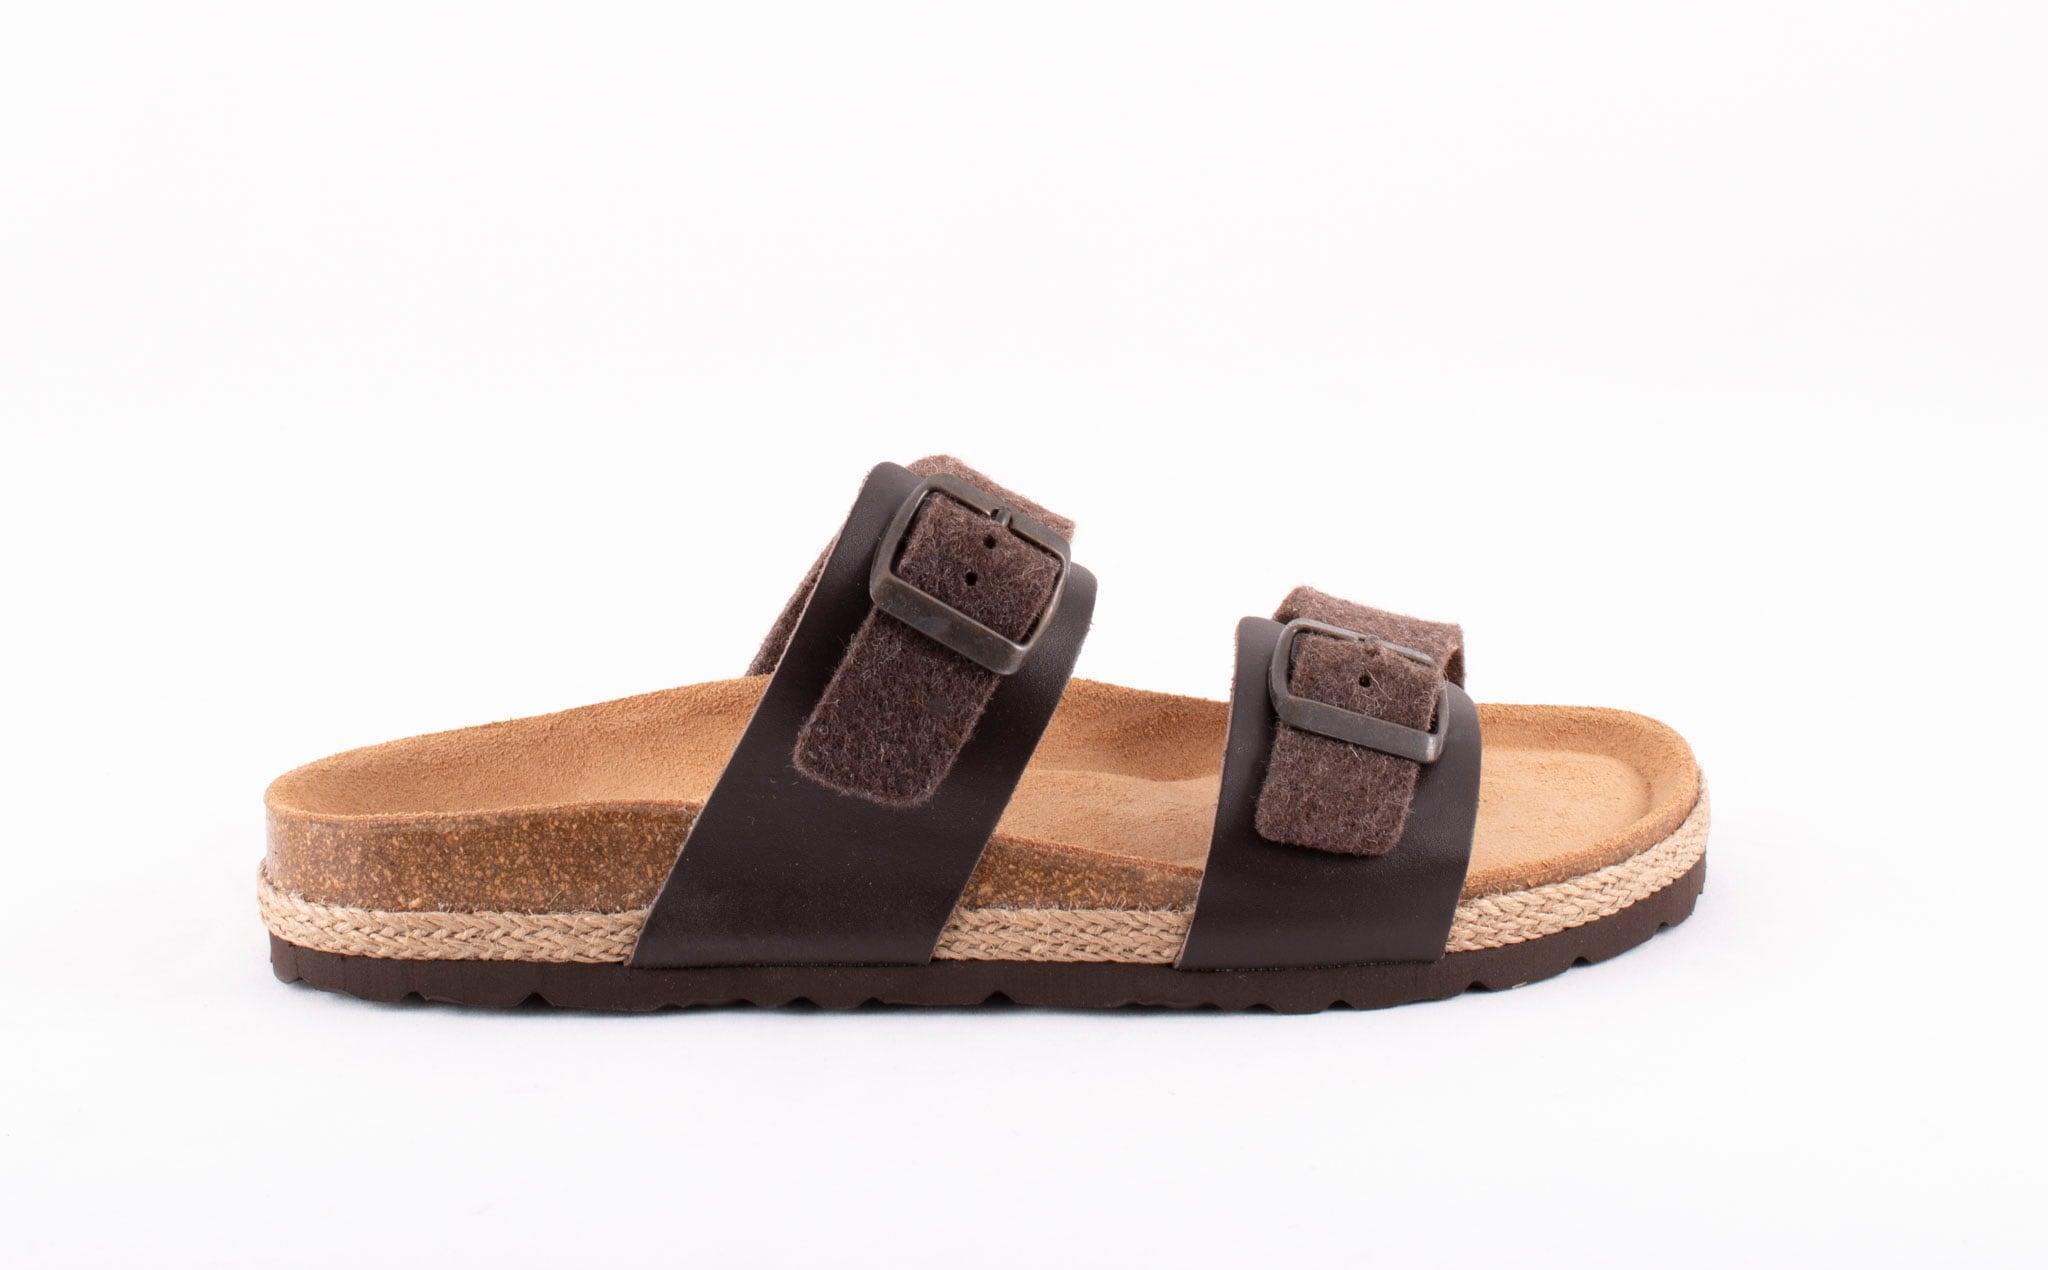 Kicki ull sandal